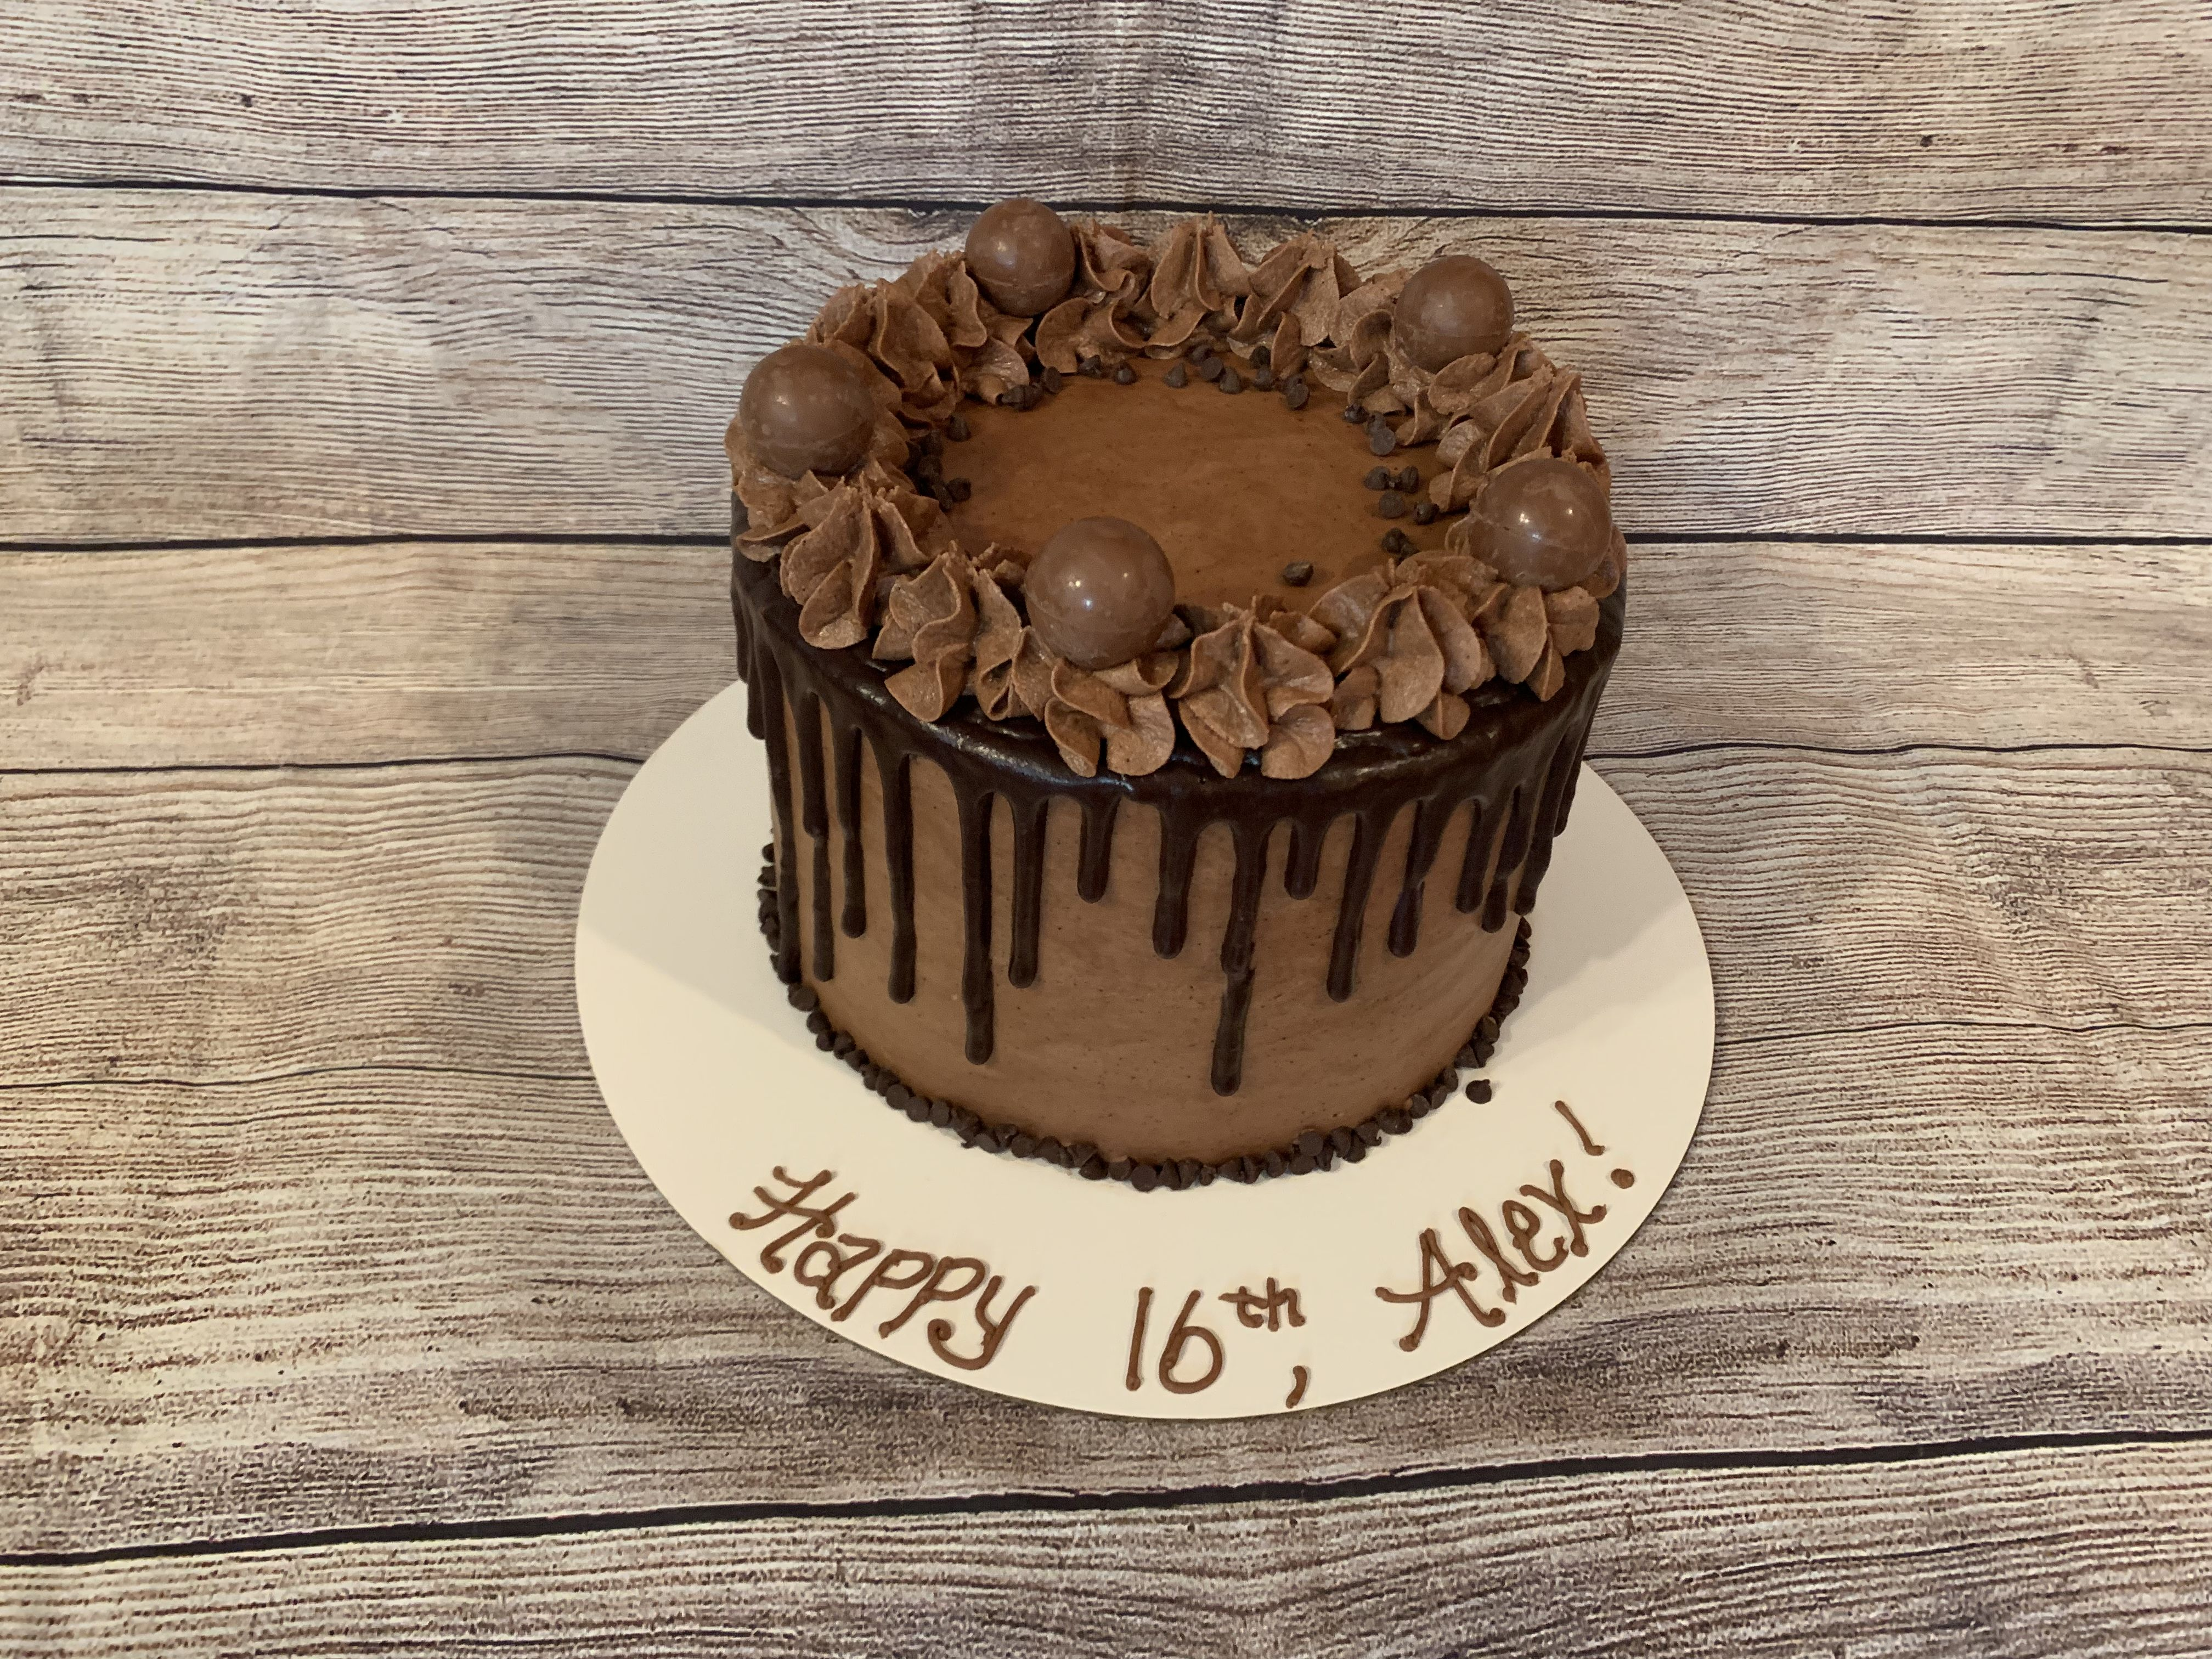 Triple Chocolate Truffle Ganache Drip Cake Chocolate Ganache Cake Recipe Chocolate Layer Cake Recipe Easy Chocolate Fudge Cake